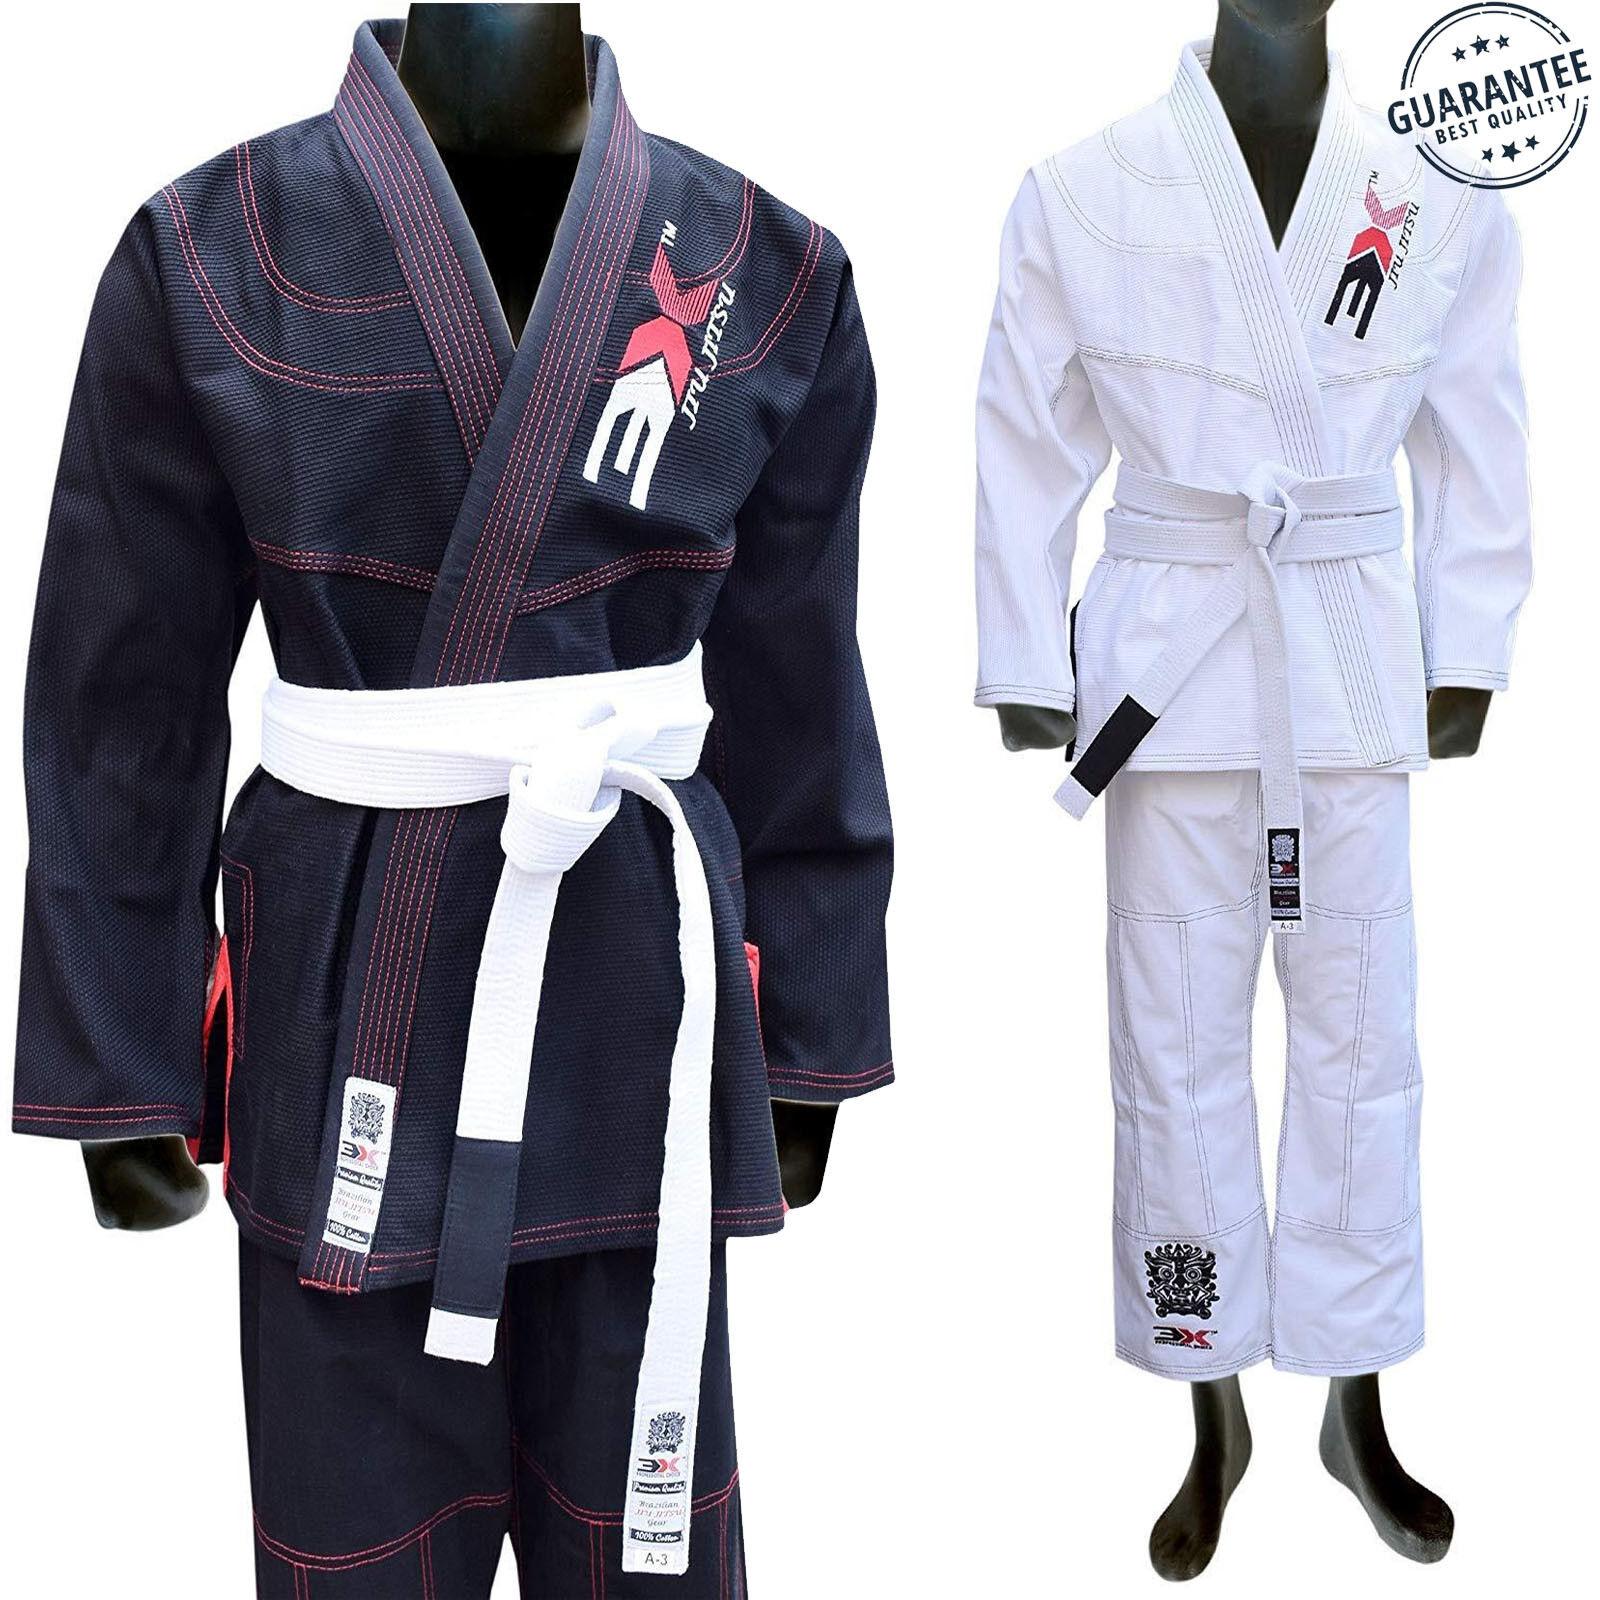 3xSports Jiu-Jitsu Classic Plain BJJ GI Pre-Shrunk Kimono karate Suit Uniform